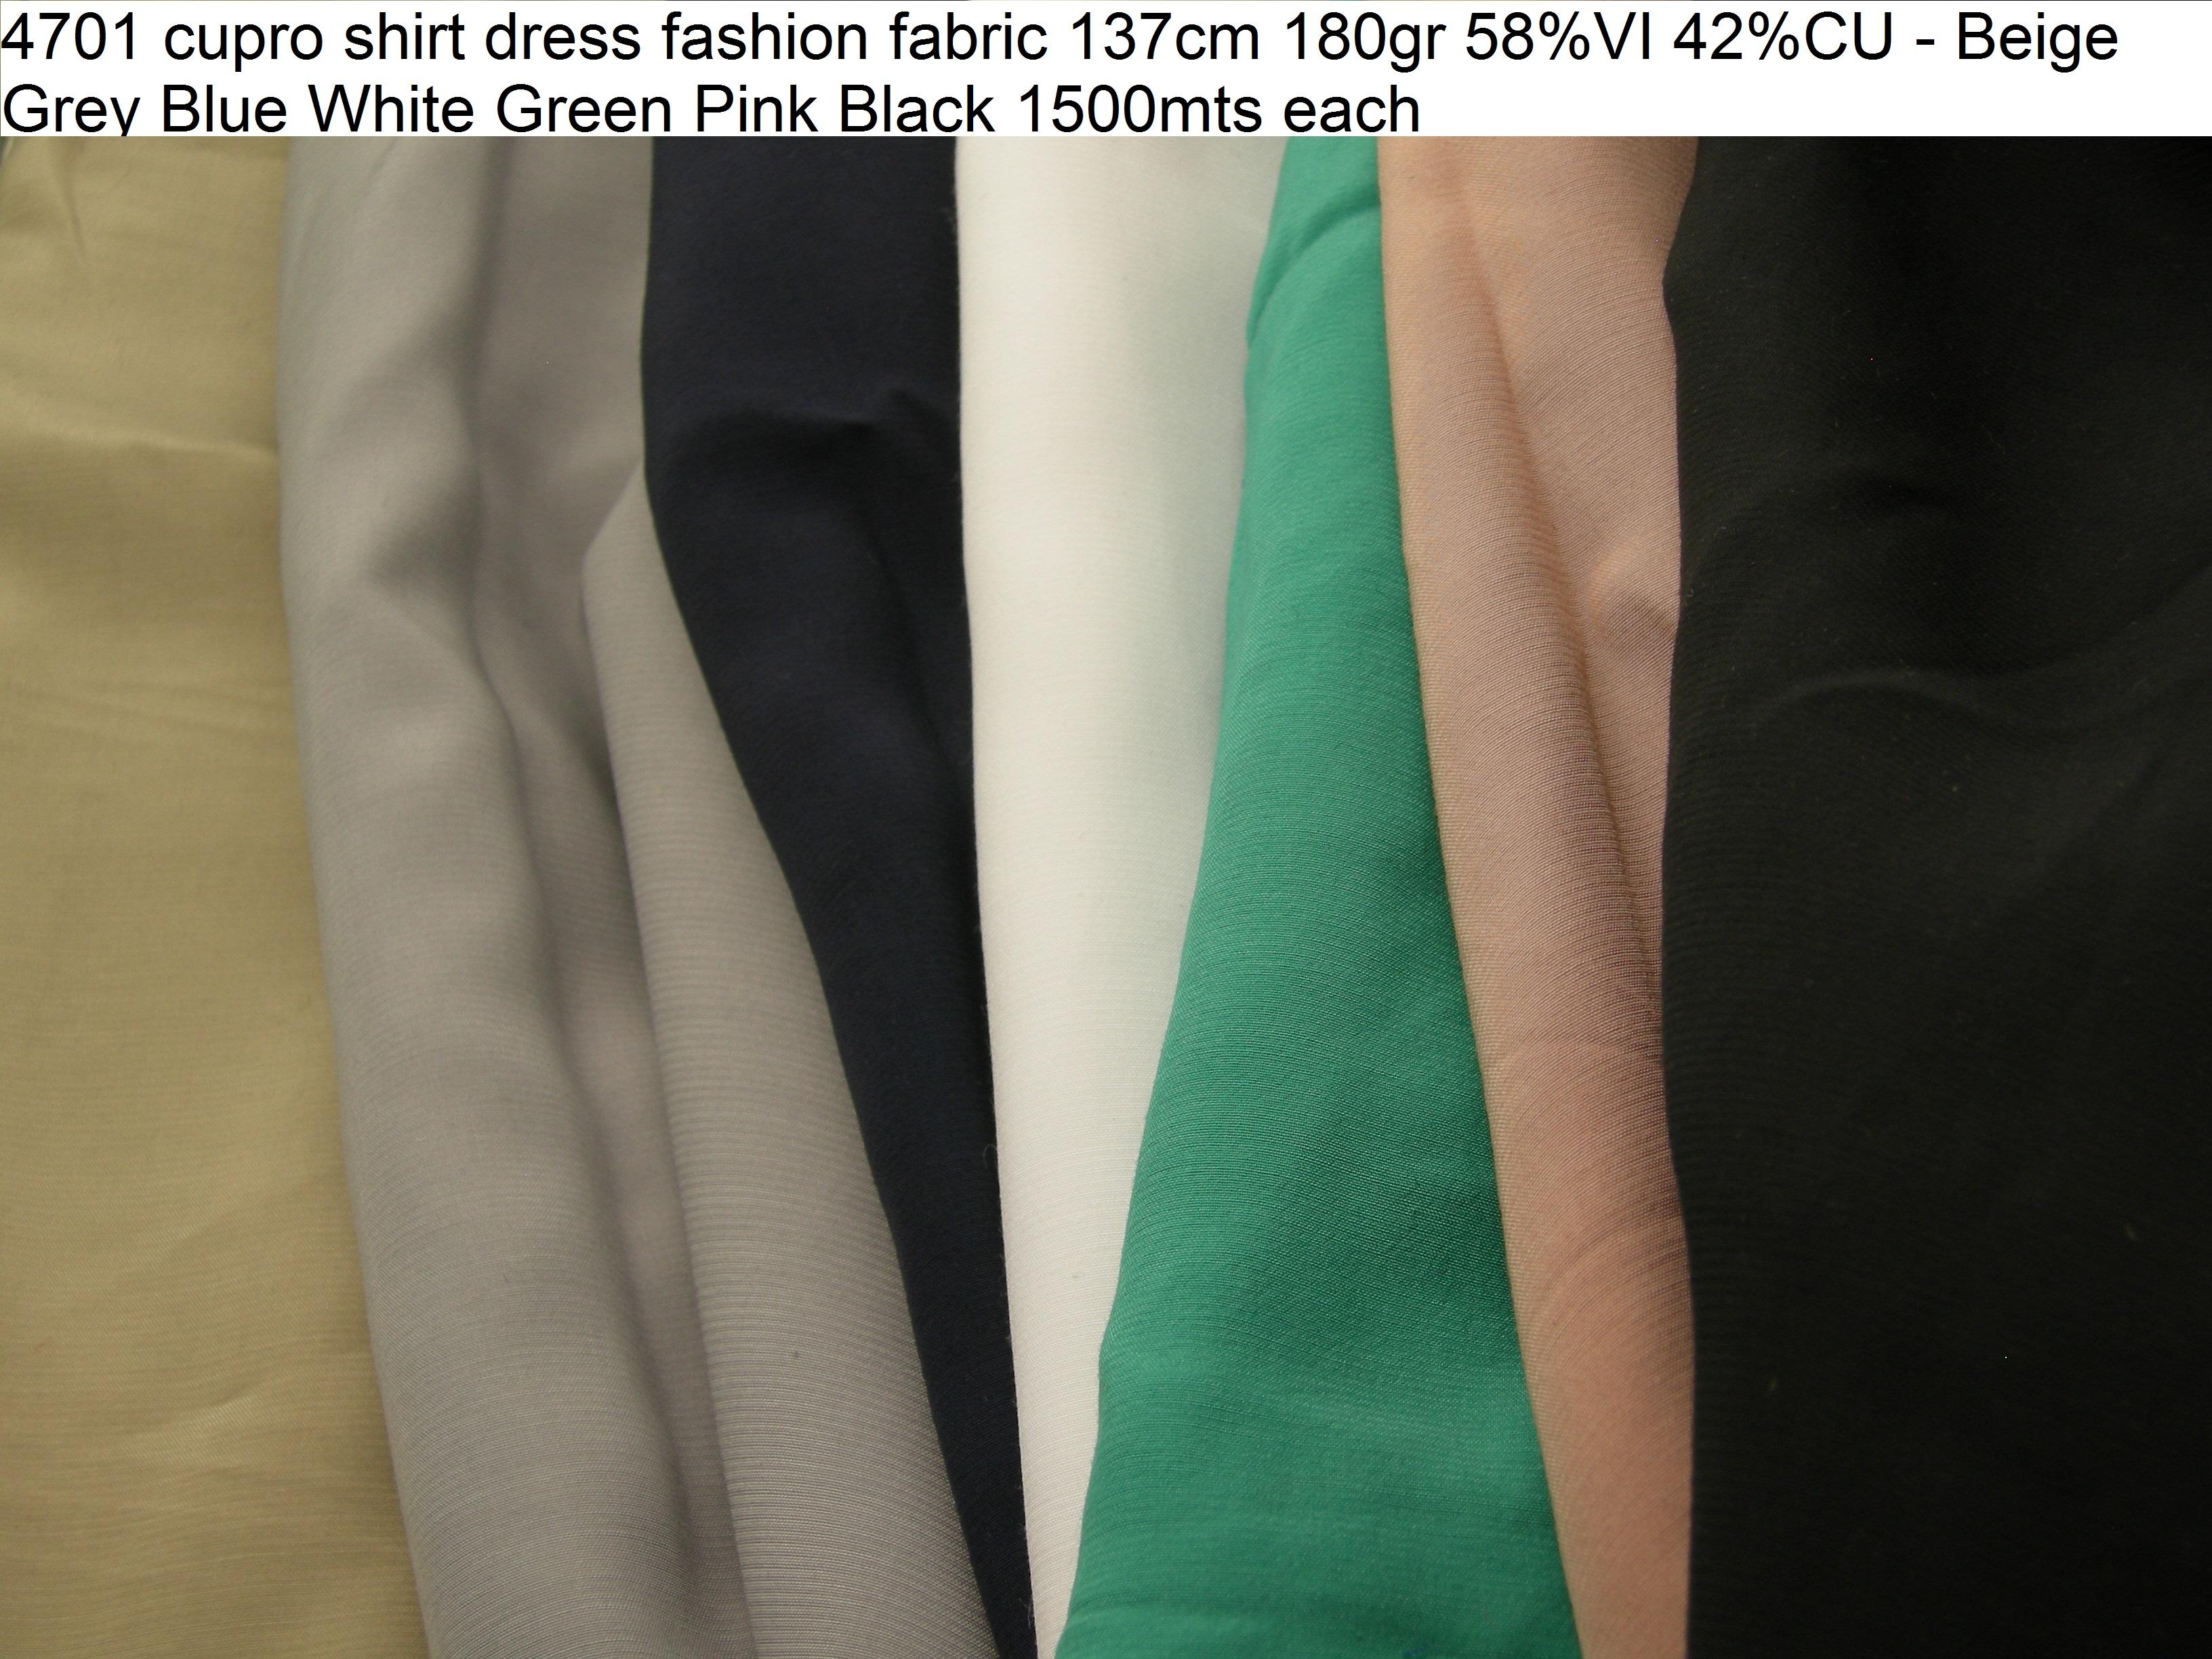 4701 cupro shirt dress fashion fabric 137cm 180gr 58VI 42CU - Beige Grey Blue White Green Pink Black 1500mts each